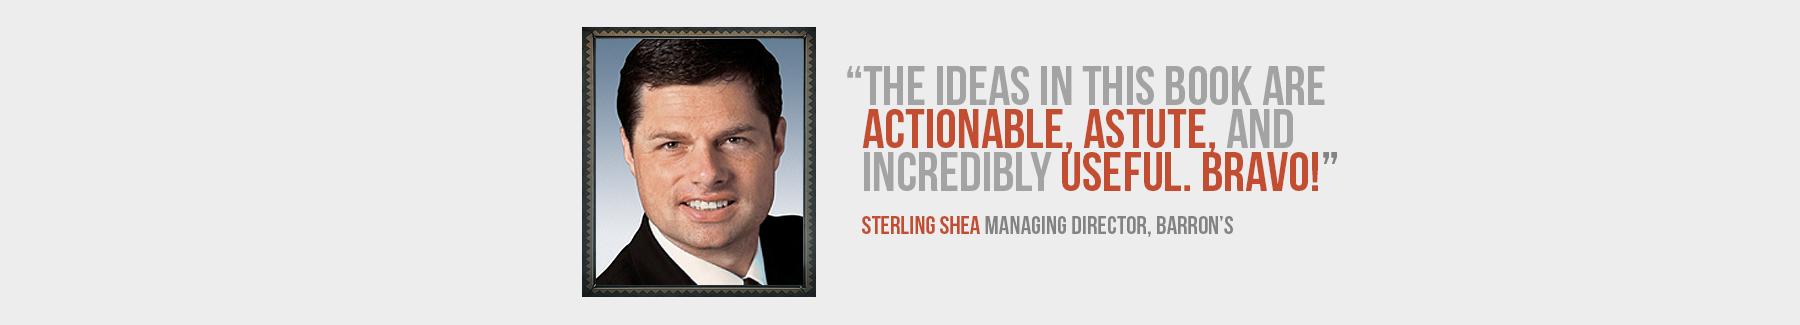 Sterling Shea headshot